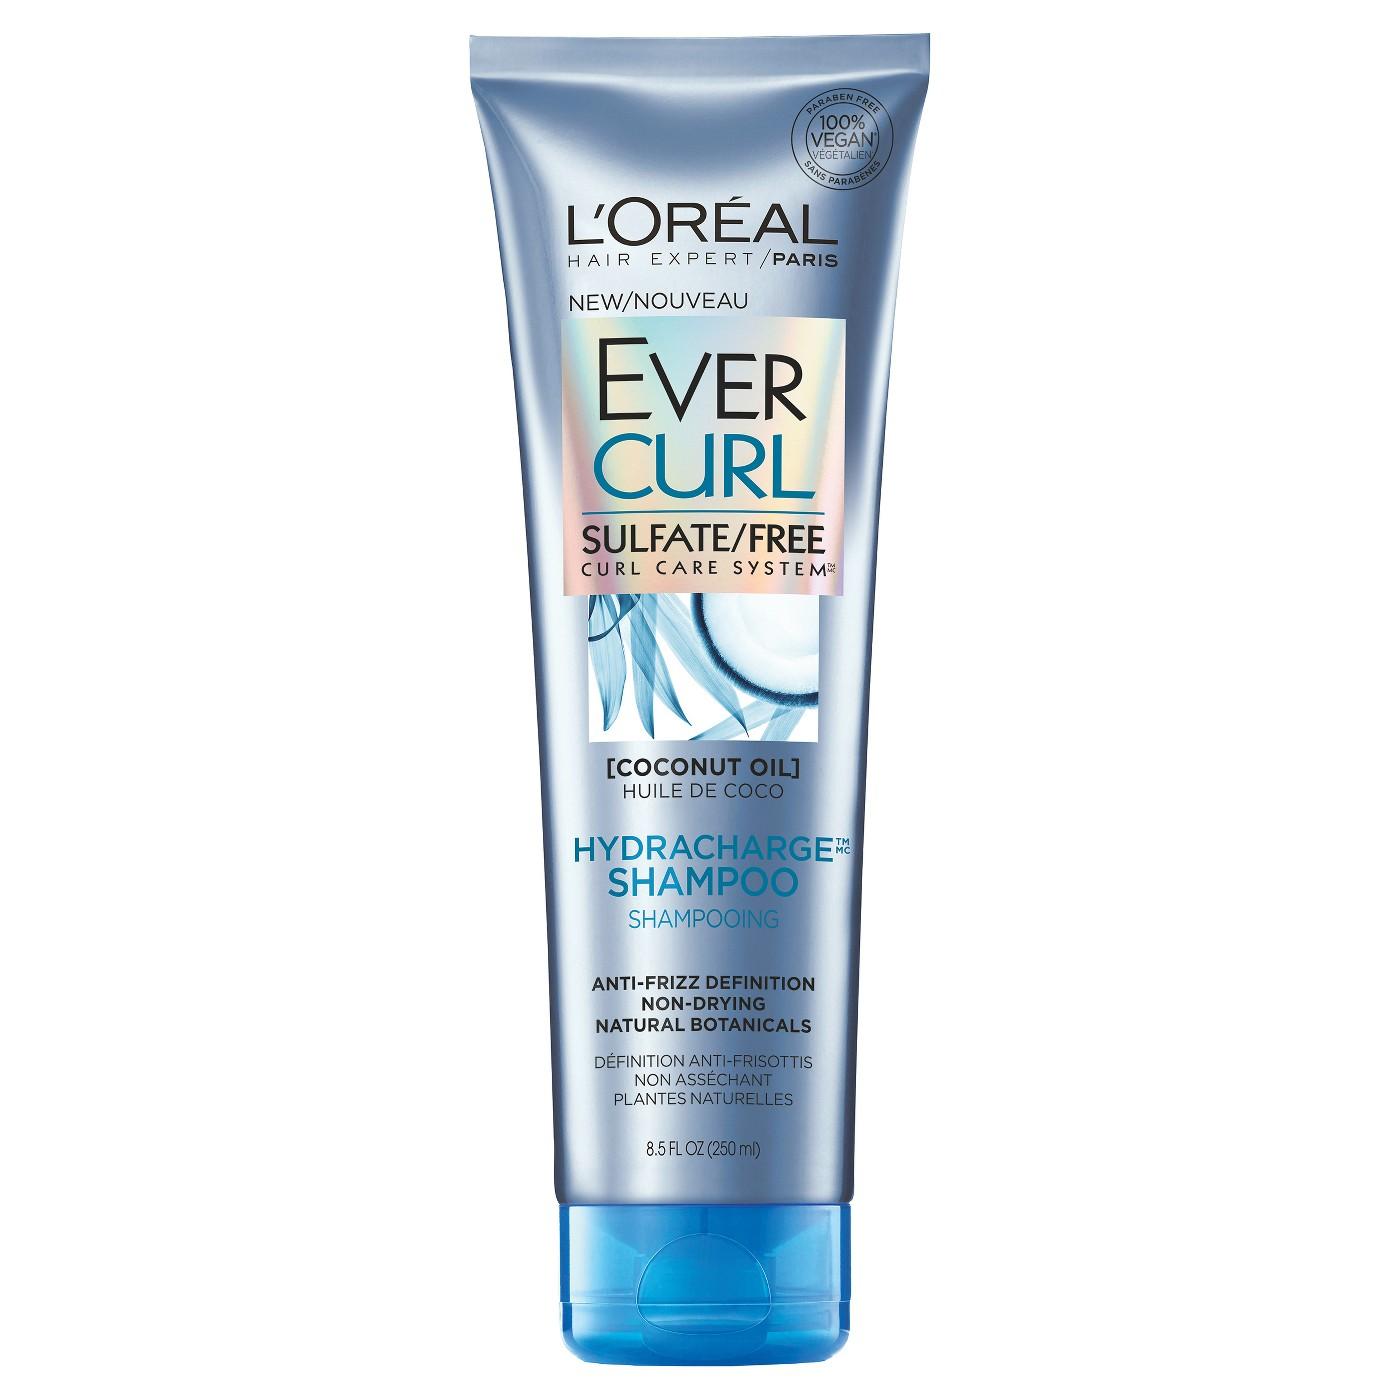 L'Oreal Ever Pure Sulfate-Free Hydracharge Shampoo